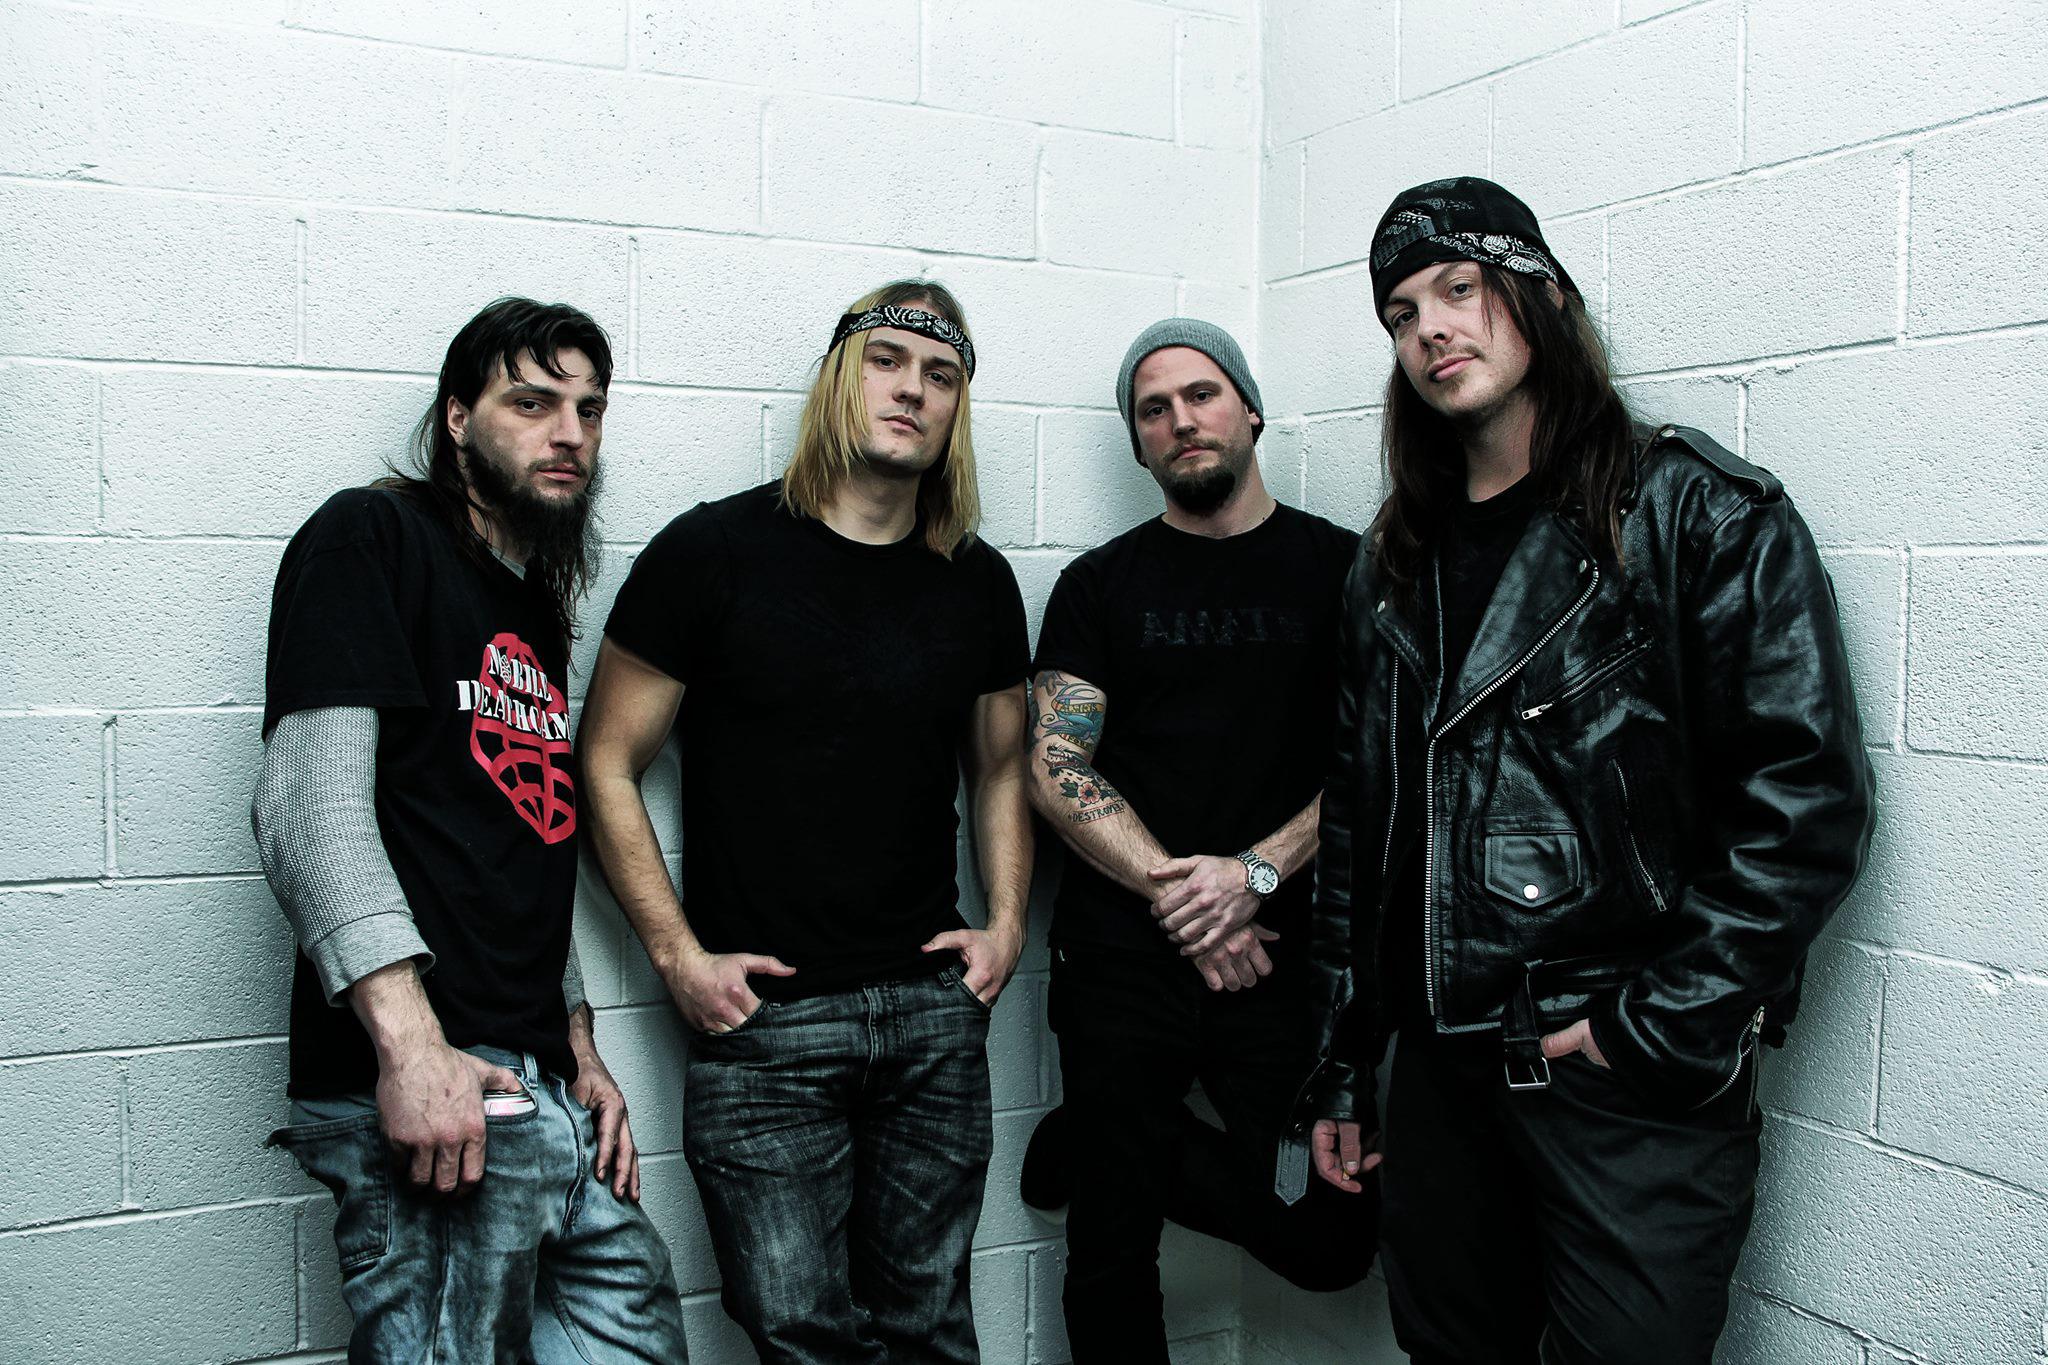 Left to right: Brian Ahern, Paul Wandtke, Mike Petrasek, Joey Brassal